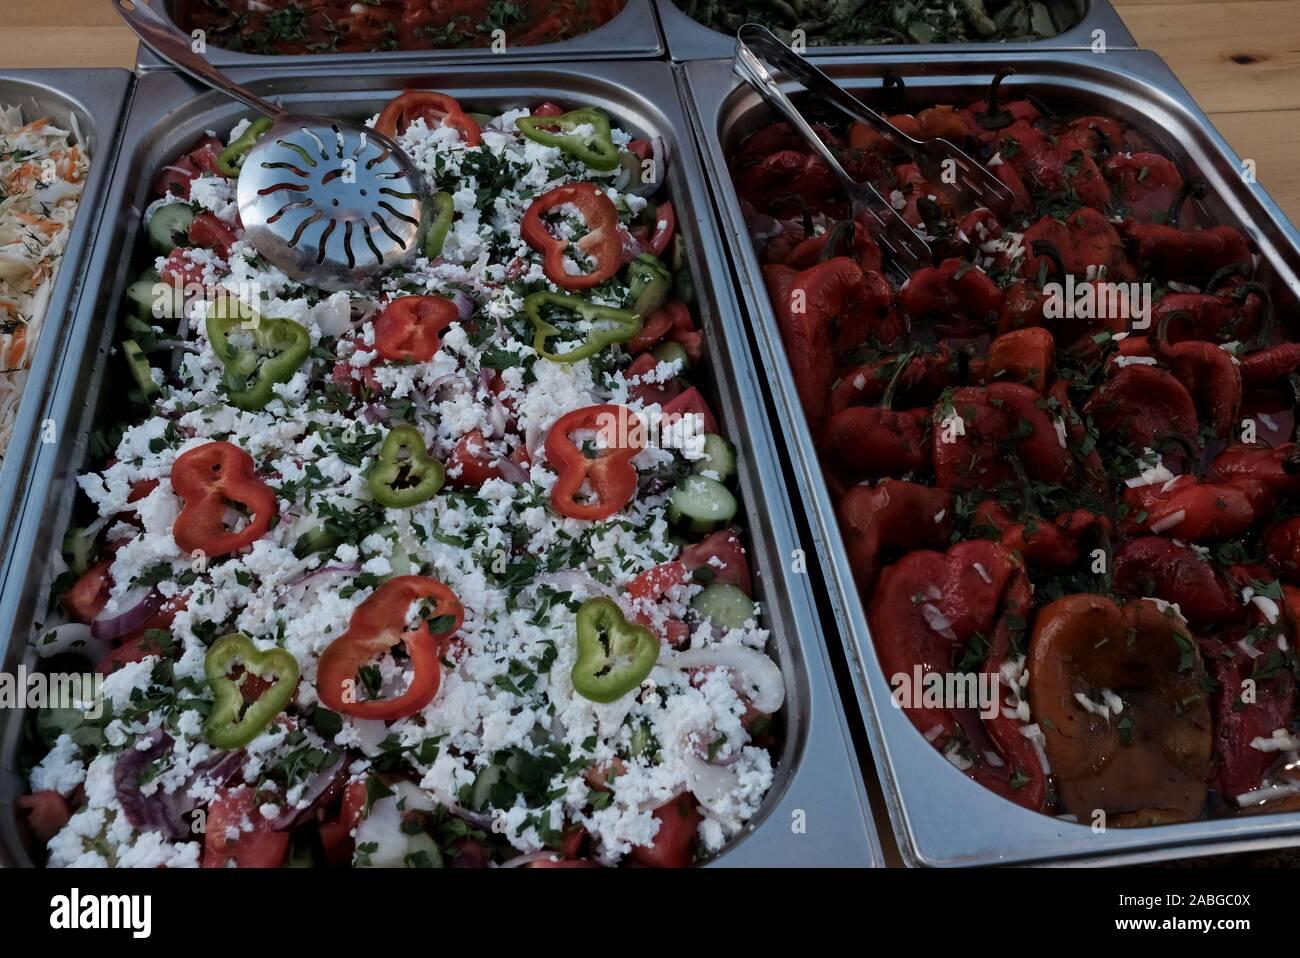 Restaurant - OLd town in PLOVDIV -Balkans - BULGARIA                       Título:TRYAVNA -- BULGARIA  Aviso de copyright: Stock Photo